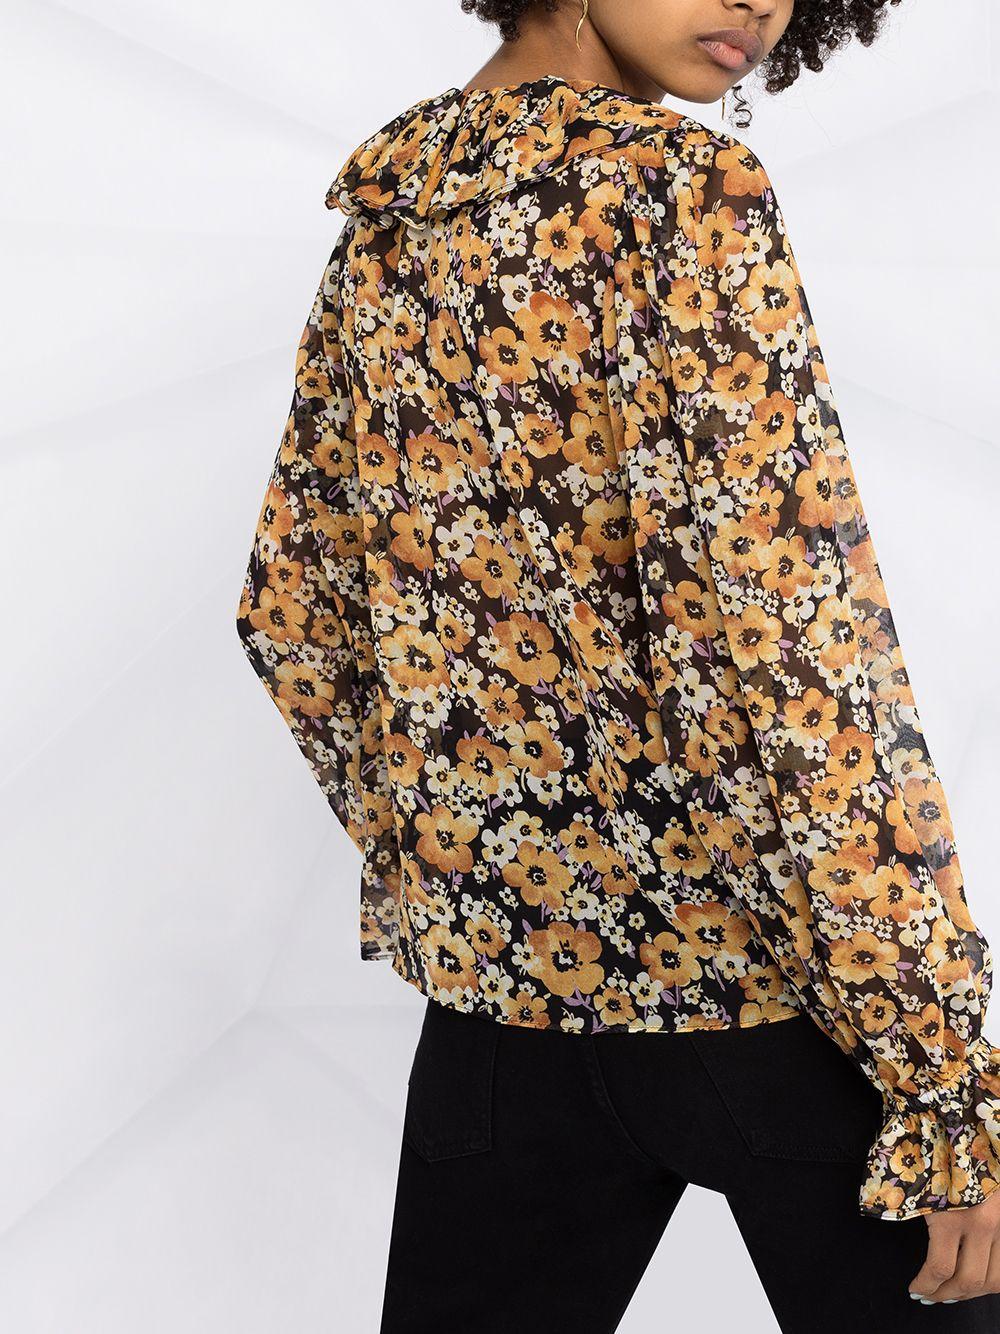 Picture of Saint Laurent   Frilled Tie Silk Blouse